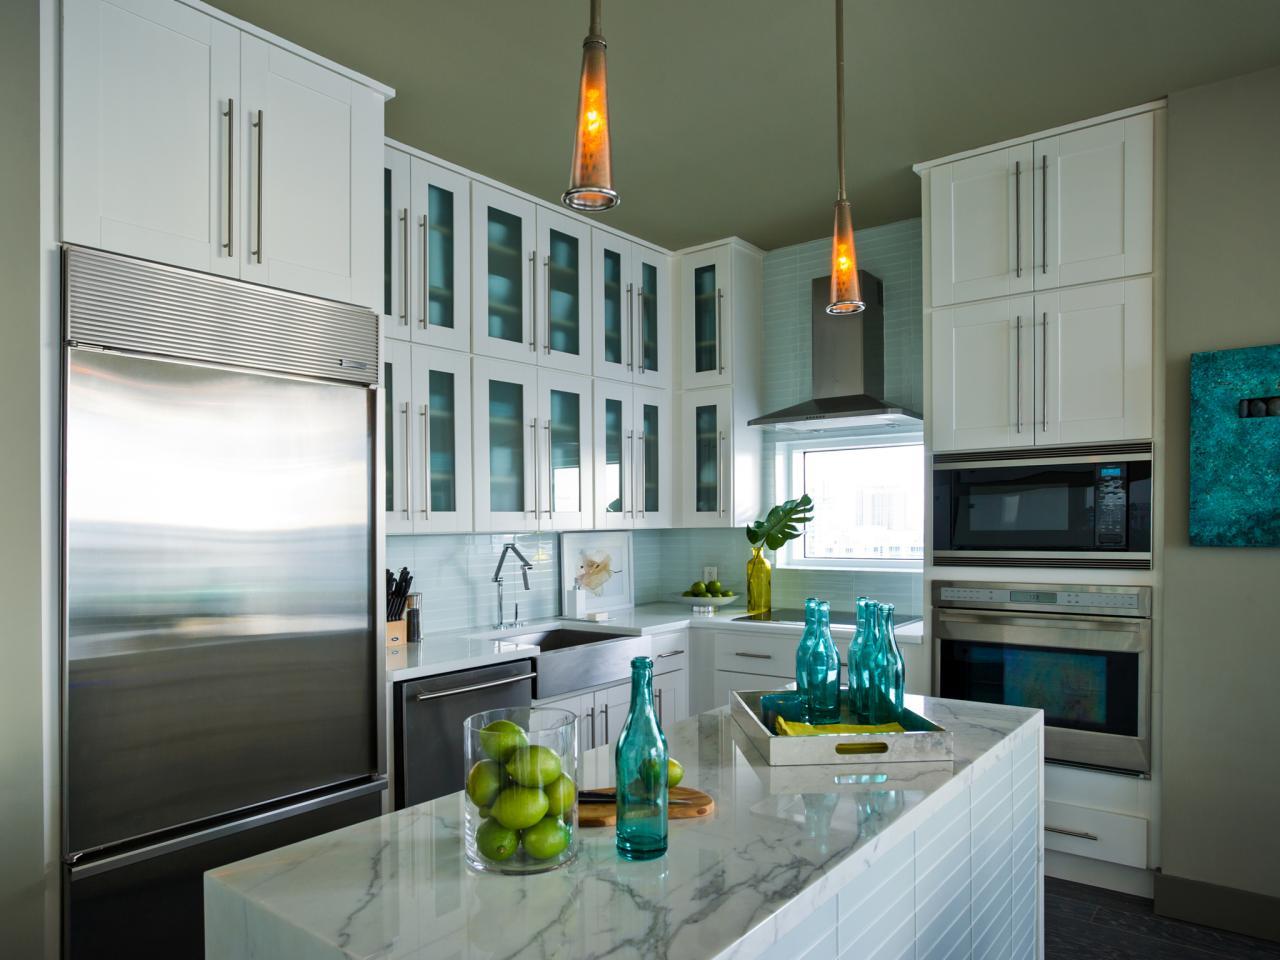 Small Kitchen Island Inspiration: HGTV Pictures & Ideas | HGTV